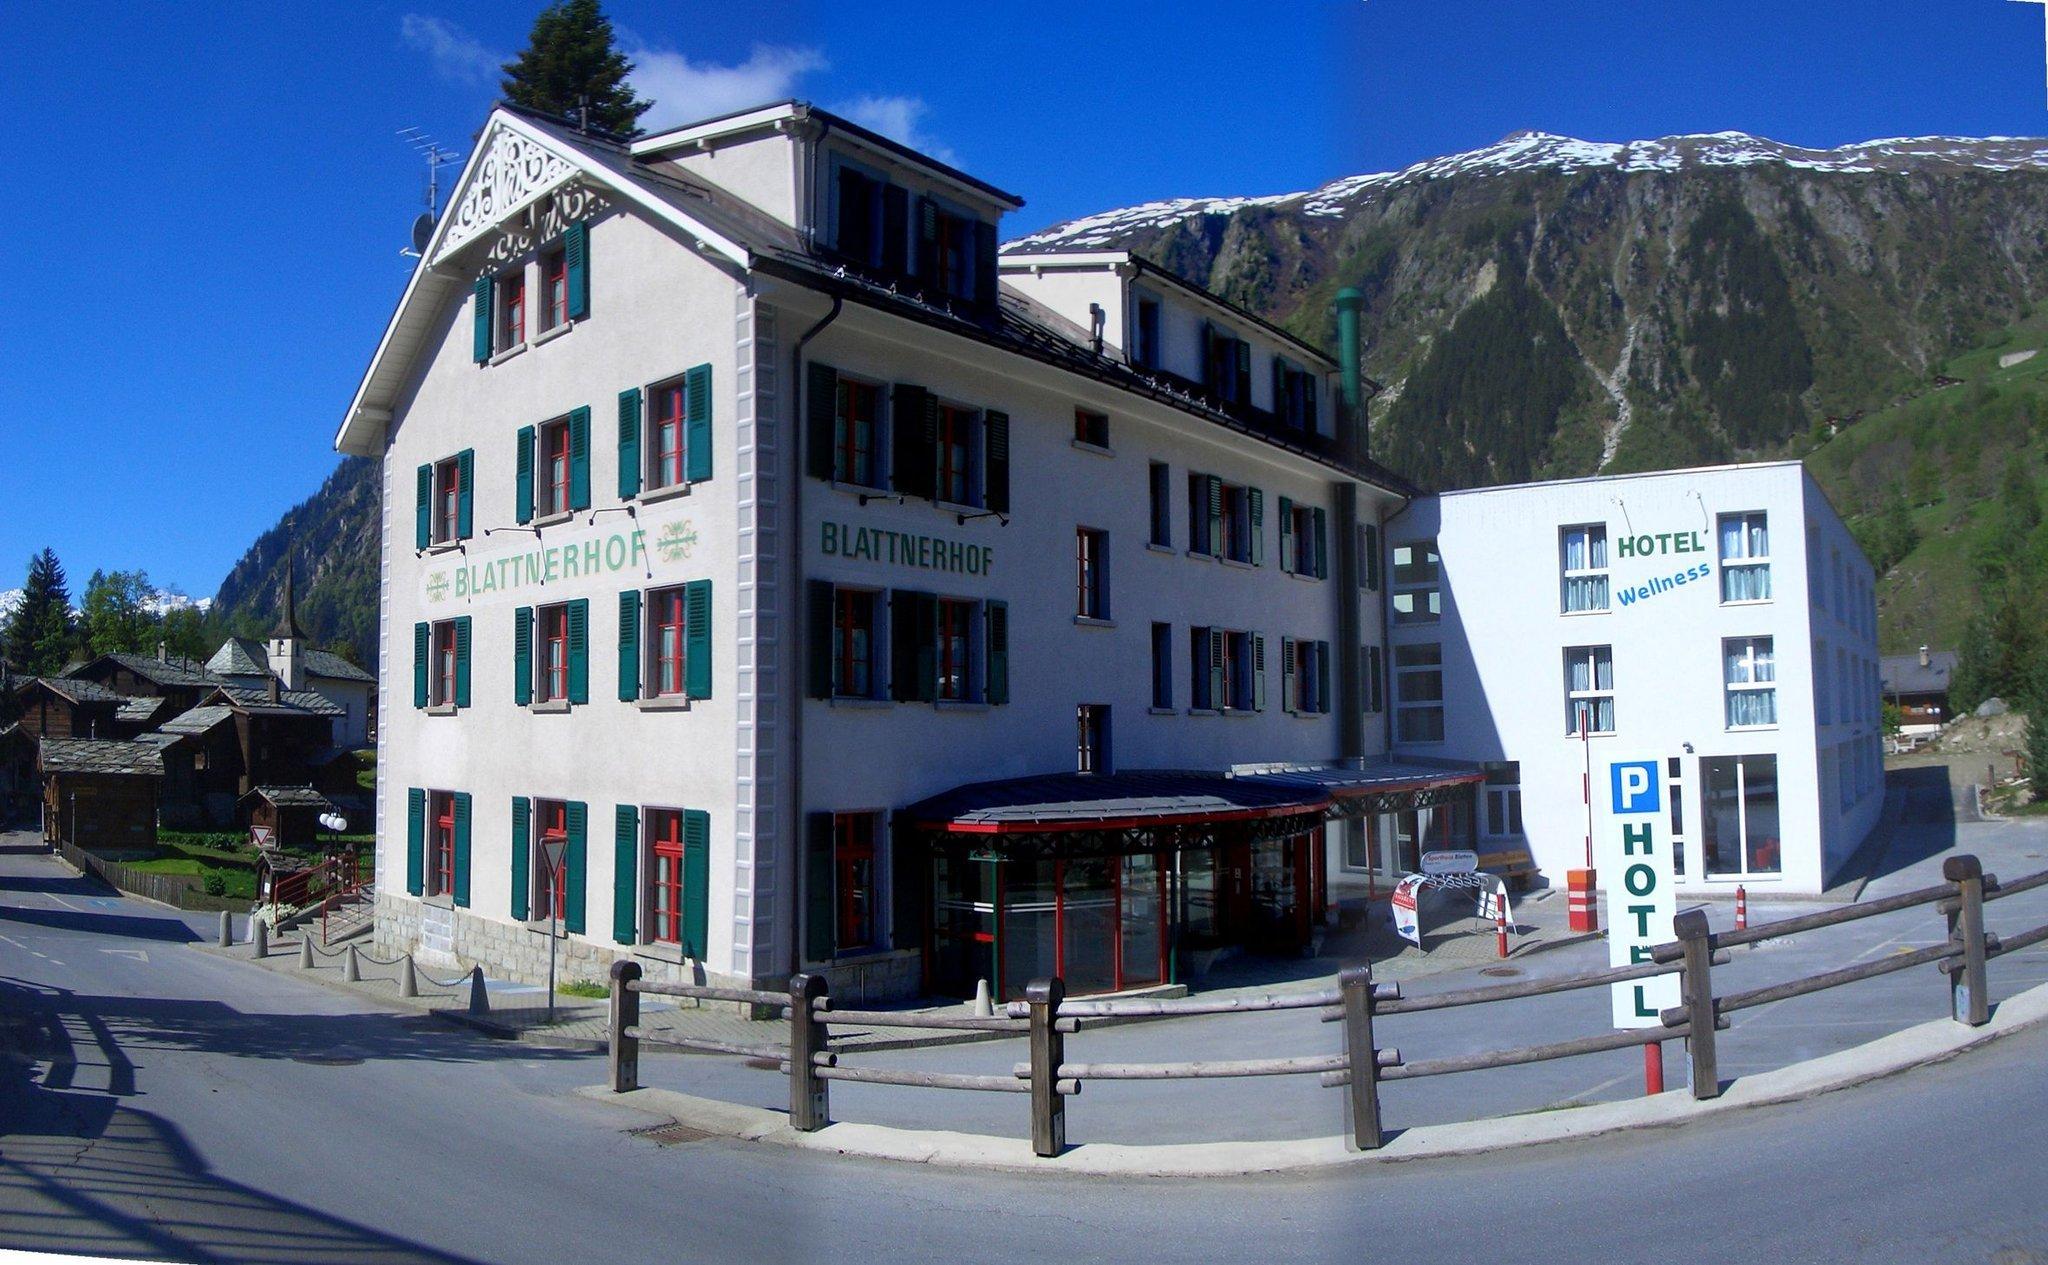 Hotel Restaurant Blattnerhof